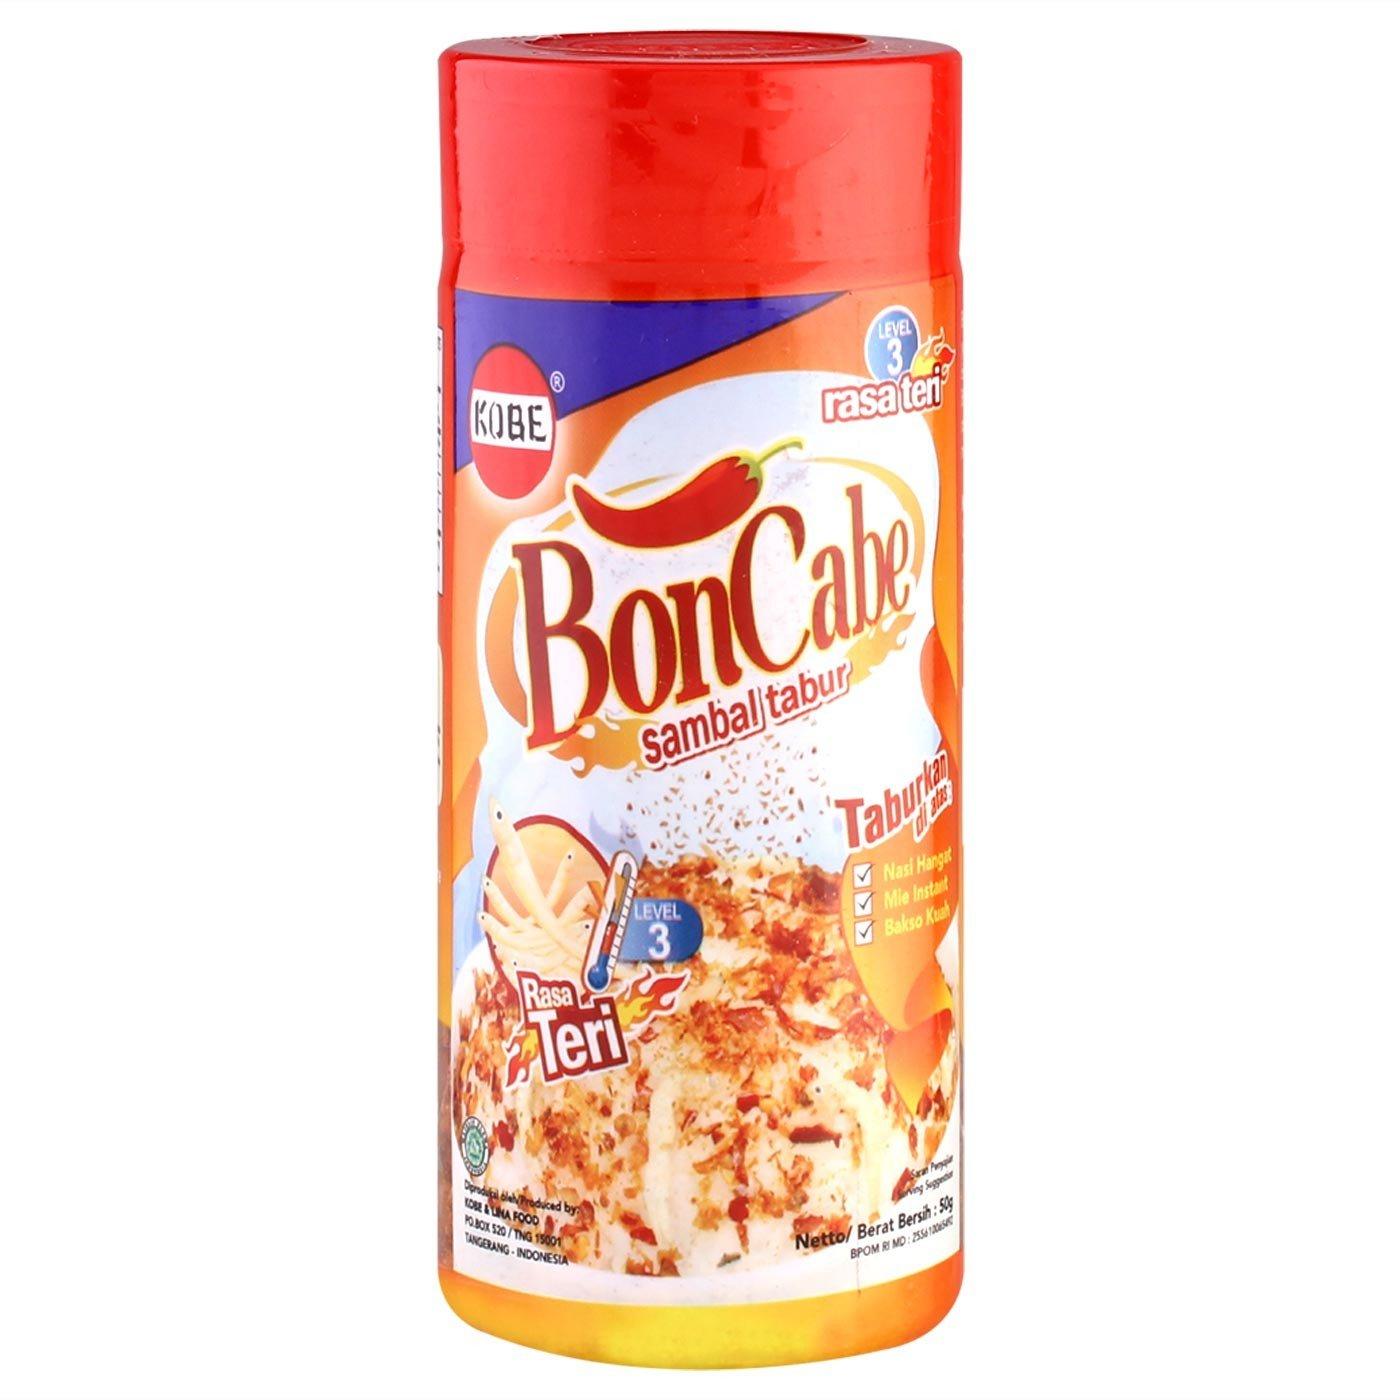 Kobe Bon Cabe Boncabe Anchovy Teri Sprinkle Chili Flakes Level 3 Sambal Cuk Travel Pack Bawang 50 Gram Of 1 Grocery